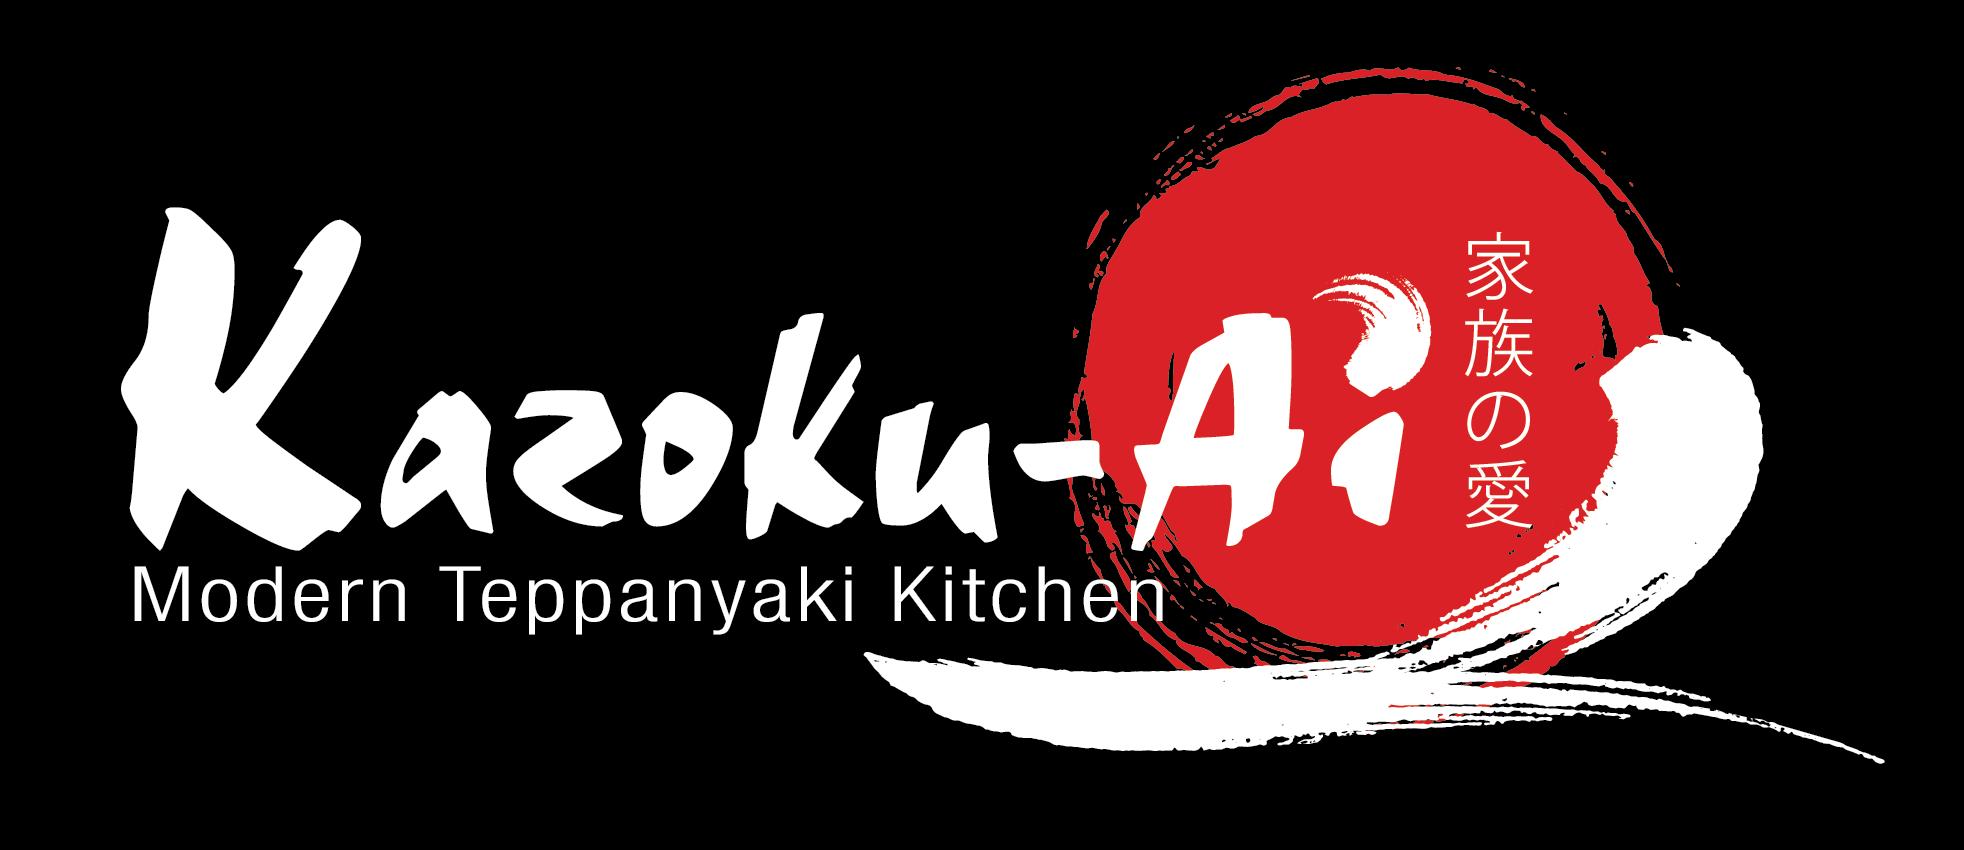 The Kazoku-Ai Modern Teppanyaki Kitchen Logo